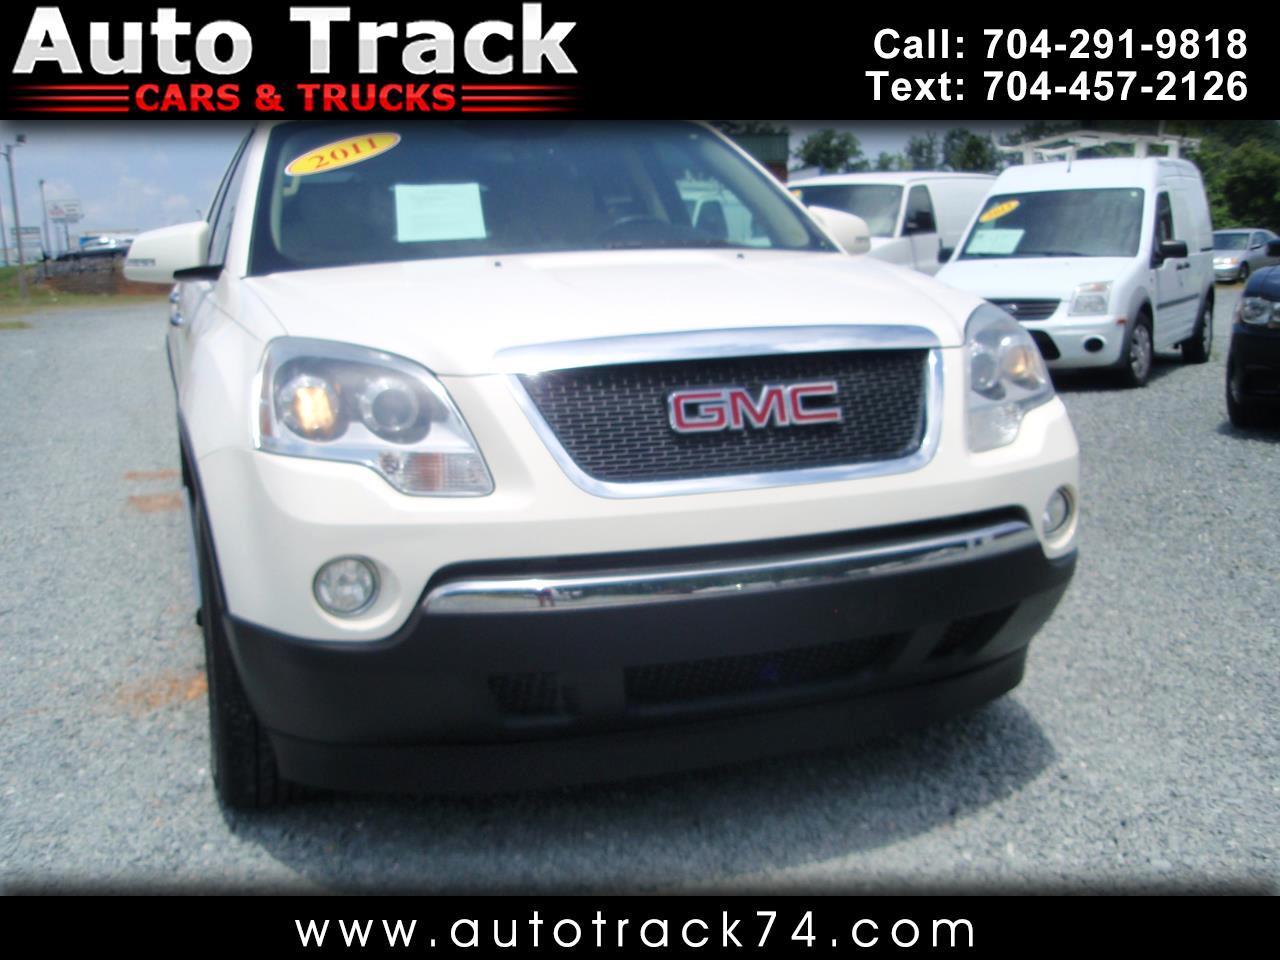 2011 GMC Acadia FWD 4dr SLT2